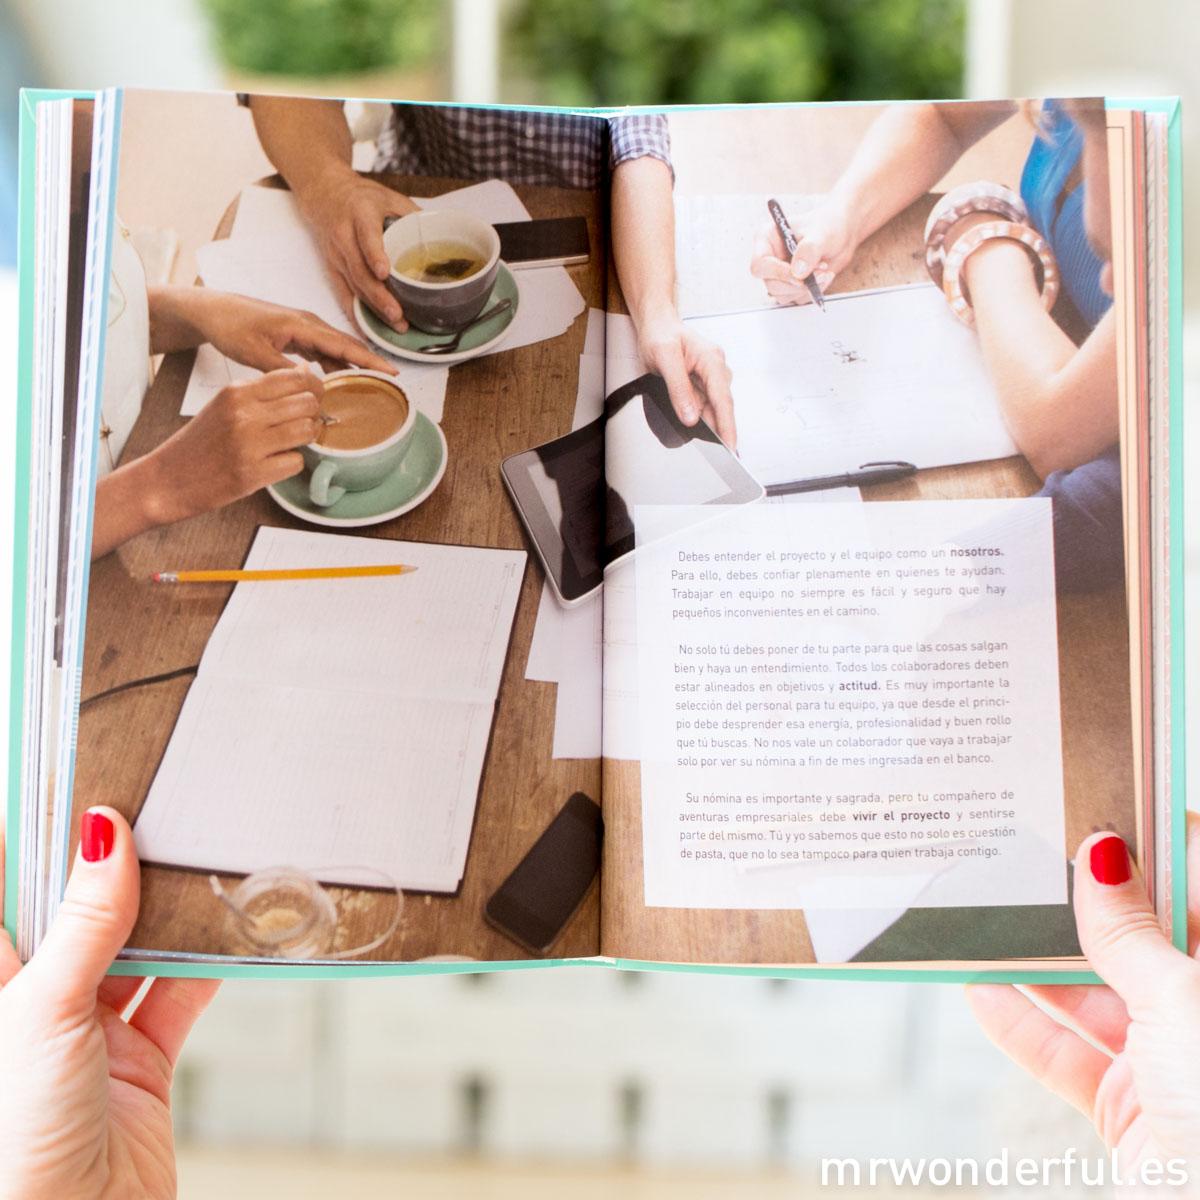 mrwonderful_libro-05_tu-idea-mola-23